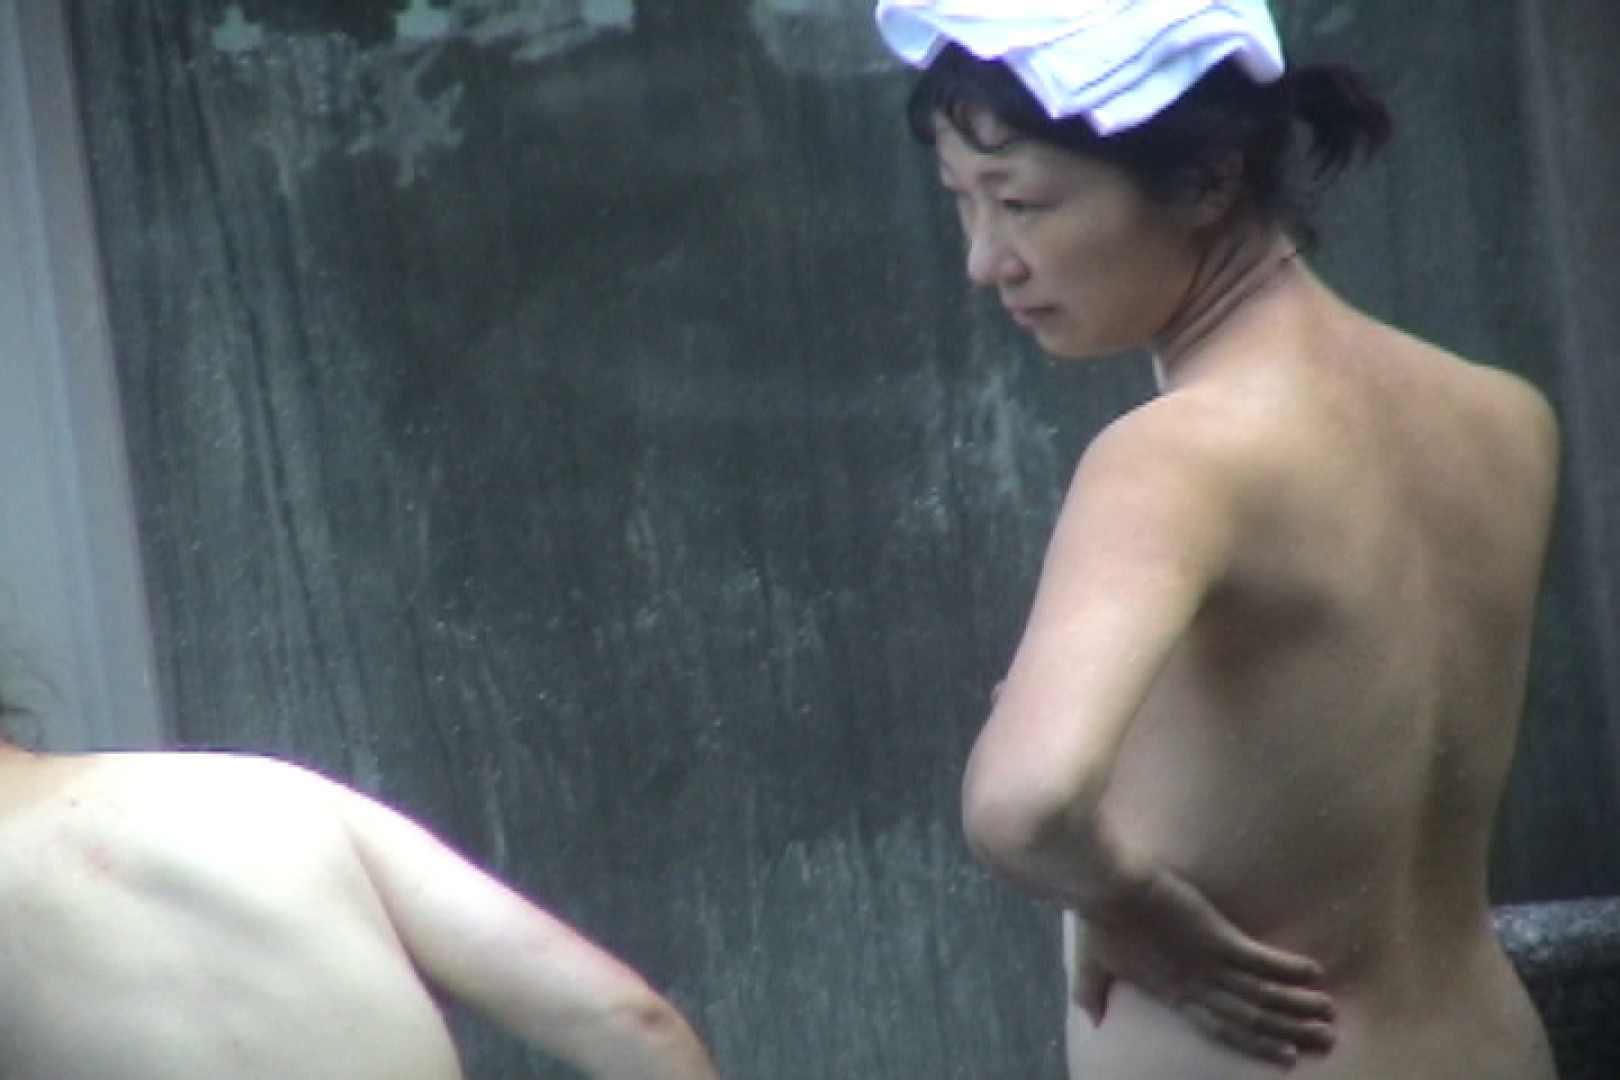 Aquaな露天風呂Vol.448 露天風呂編  90PIX 22